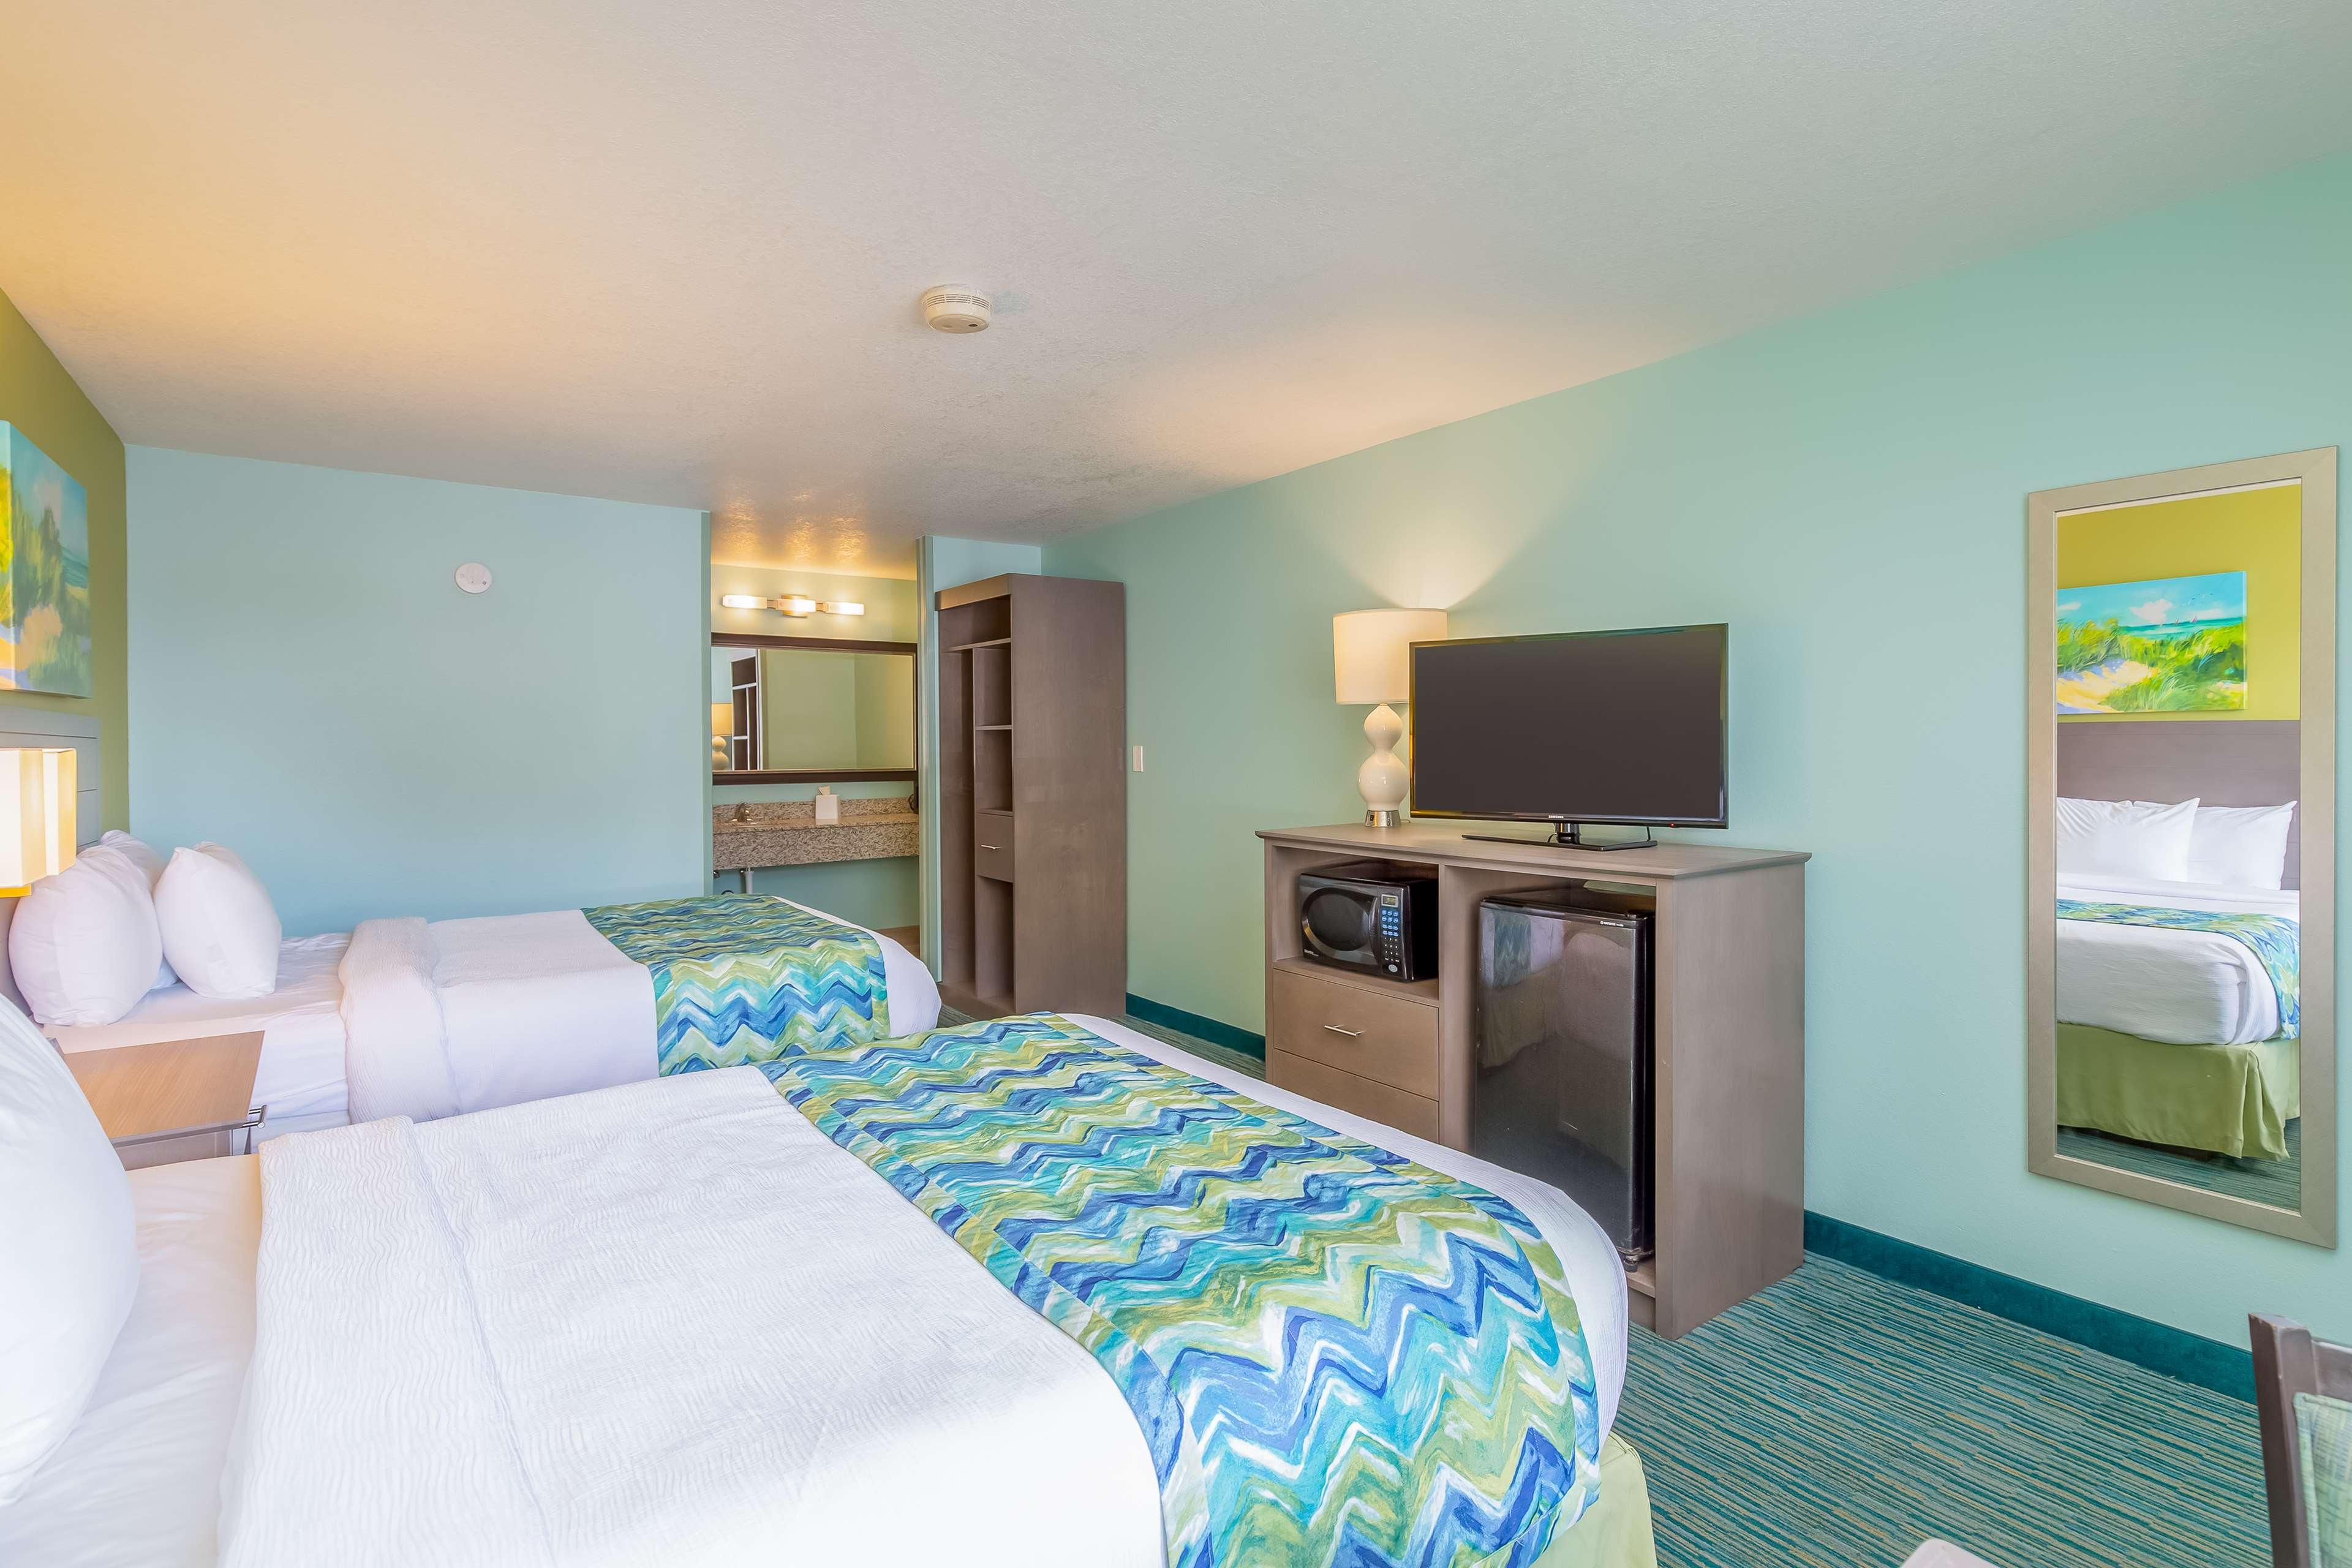 Best Western Beachside Resort image 13